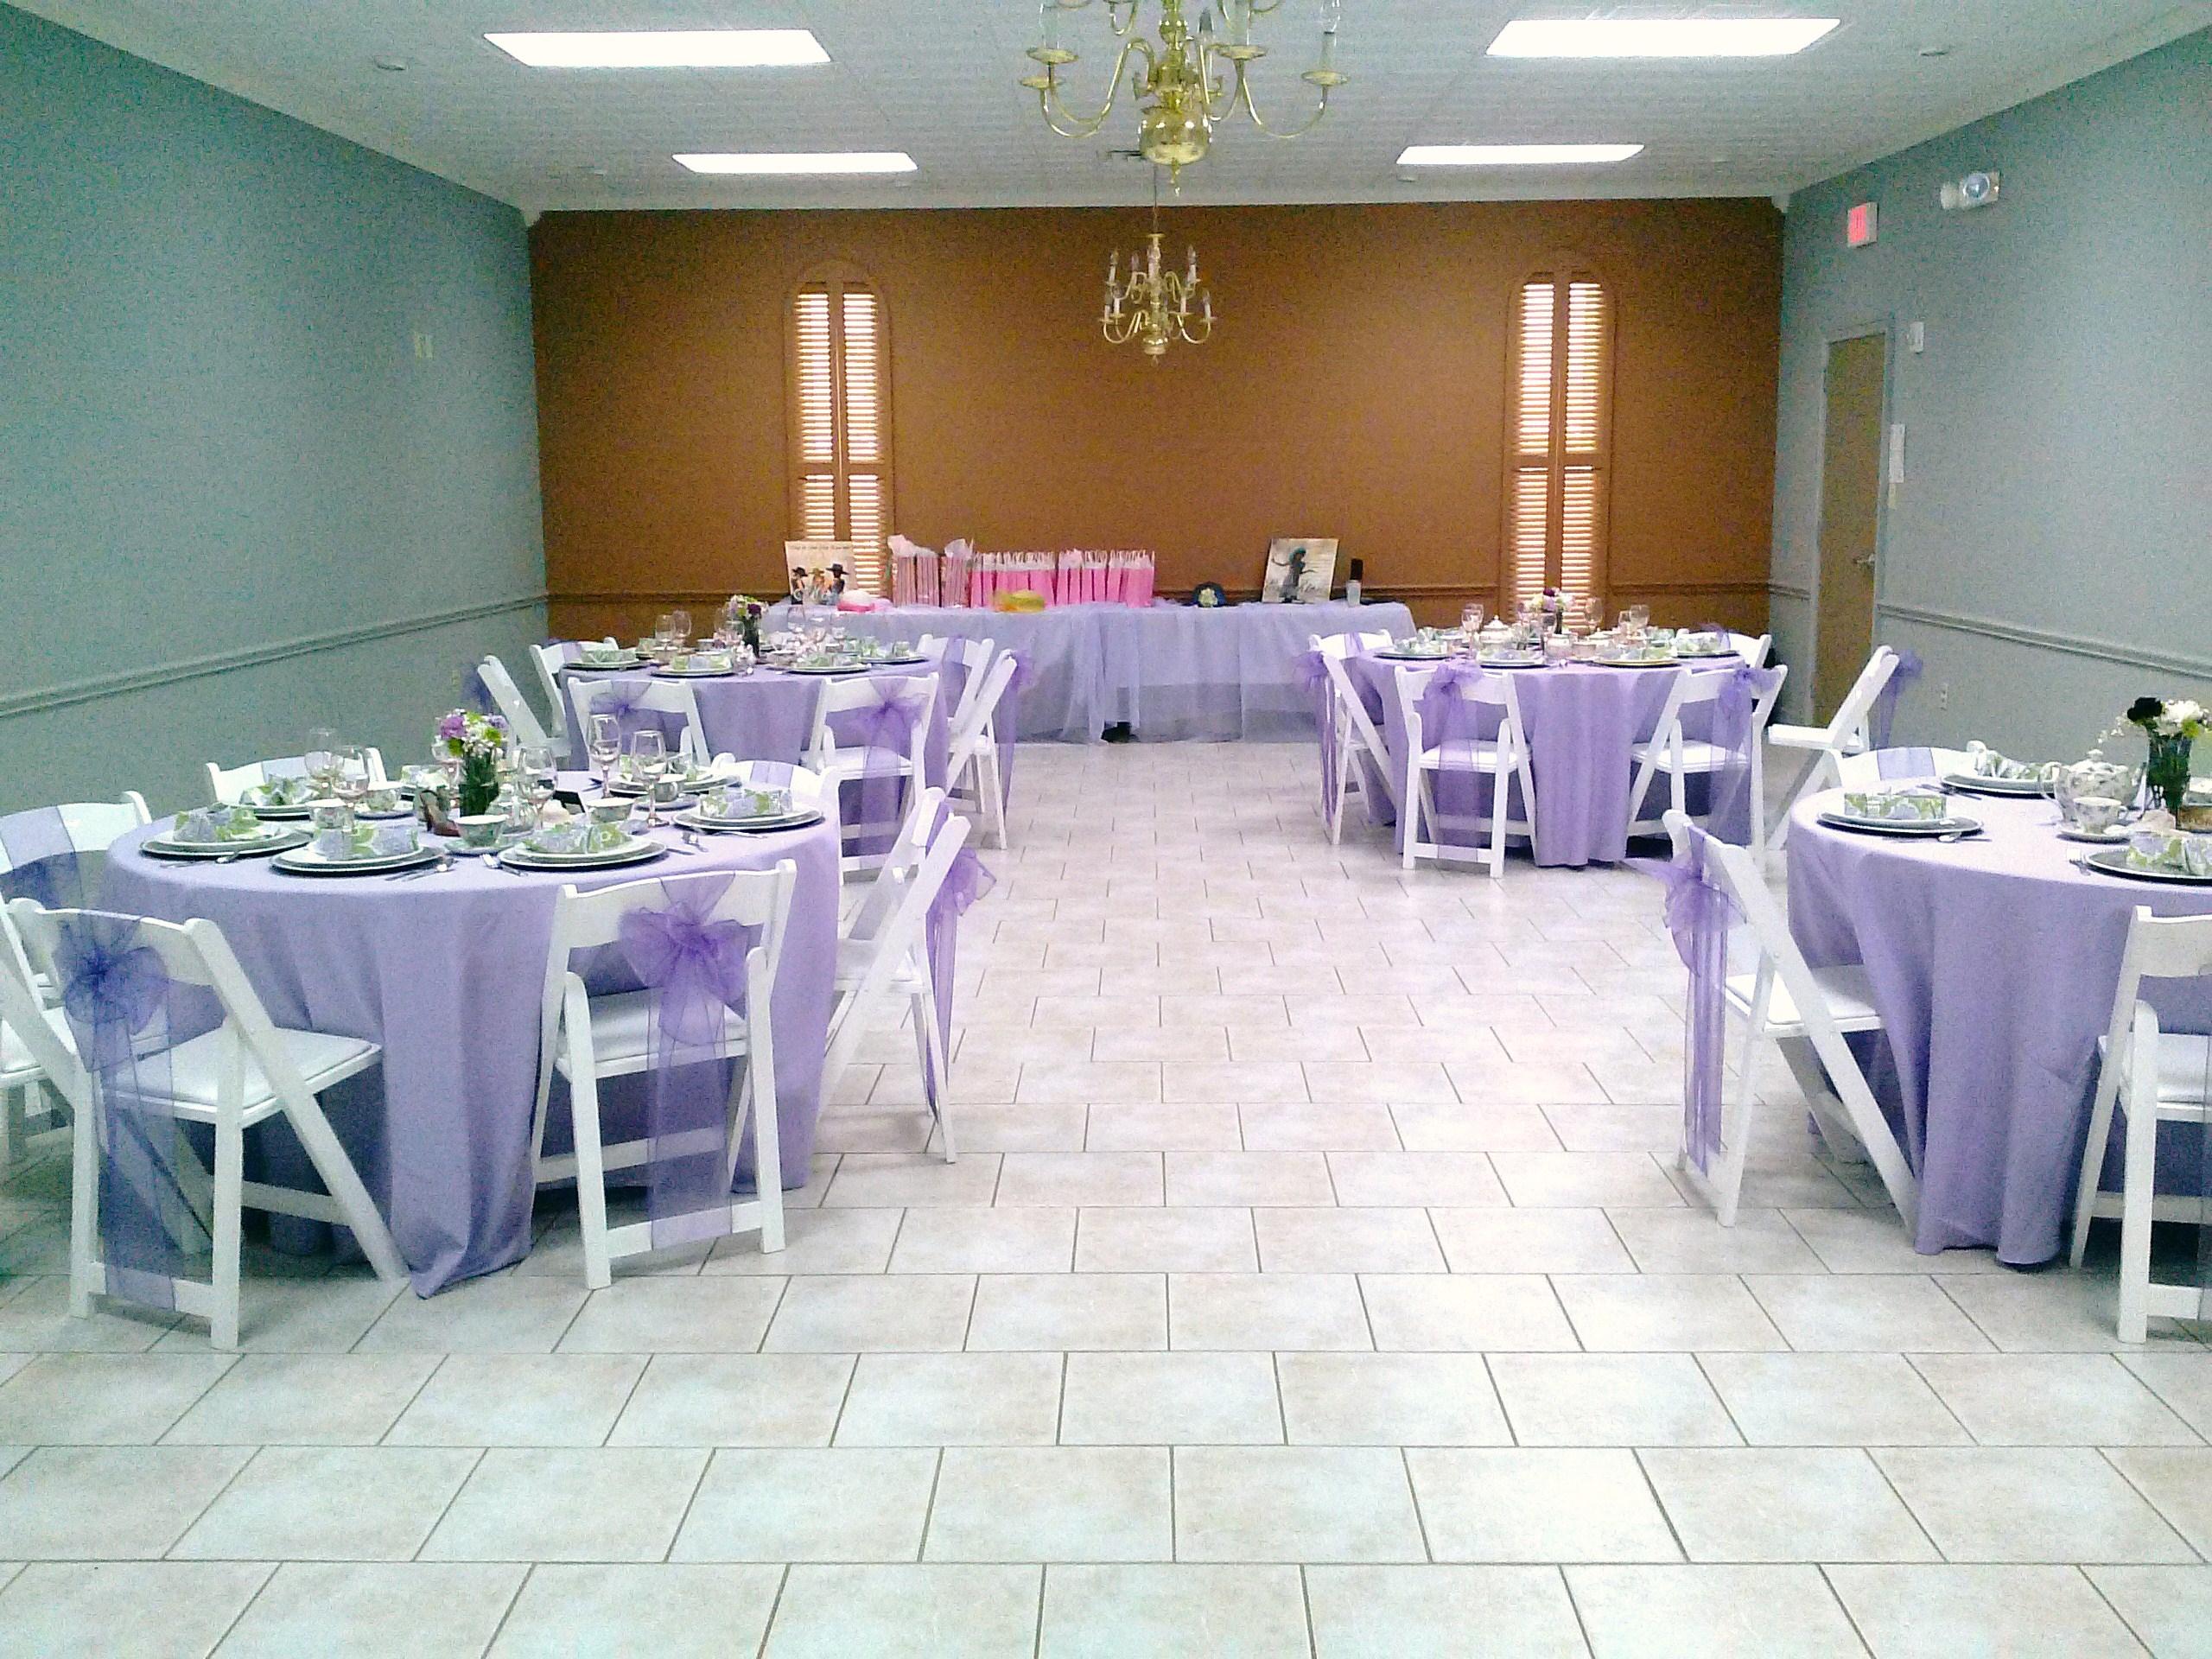 Small Banquet Hall   Killeen Arts & Activities Center